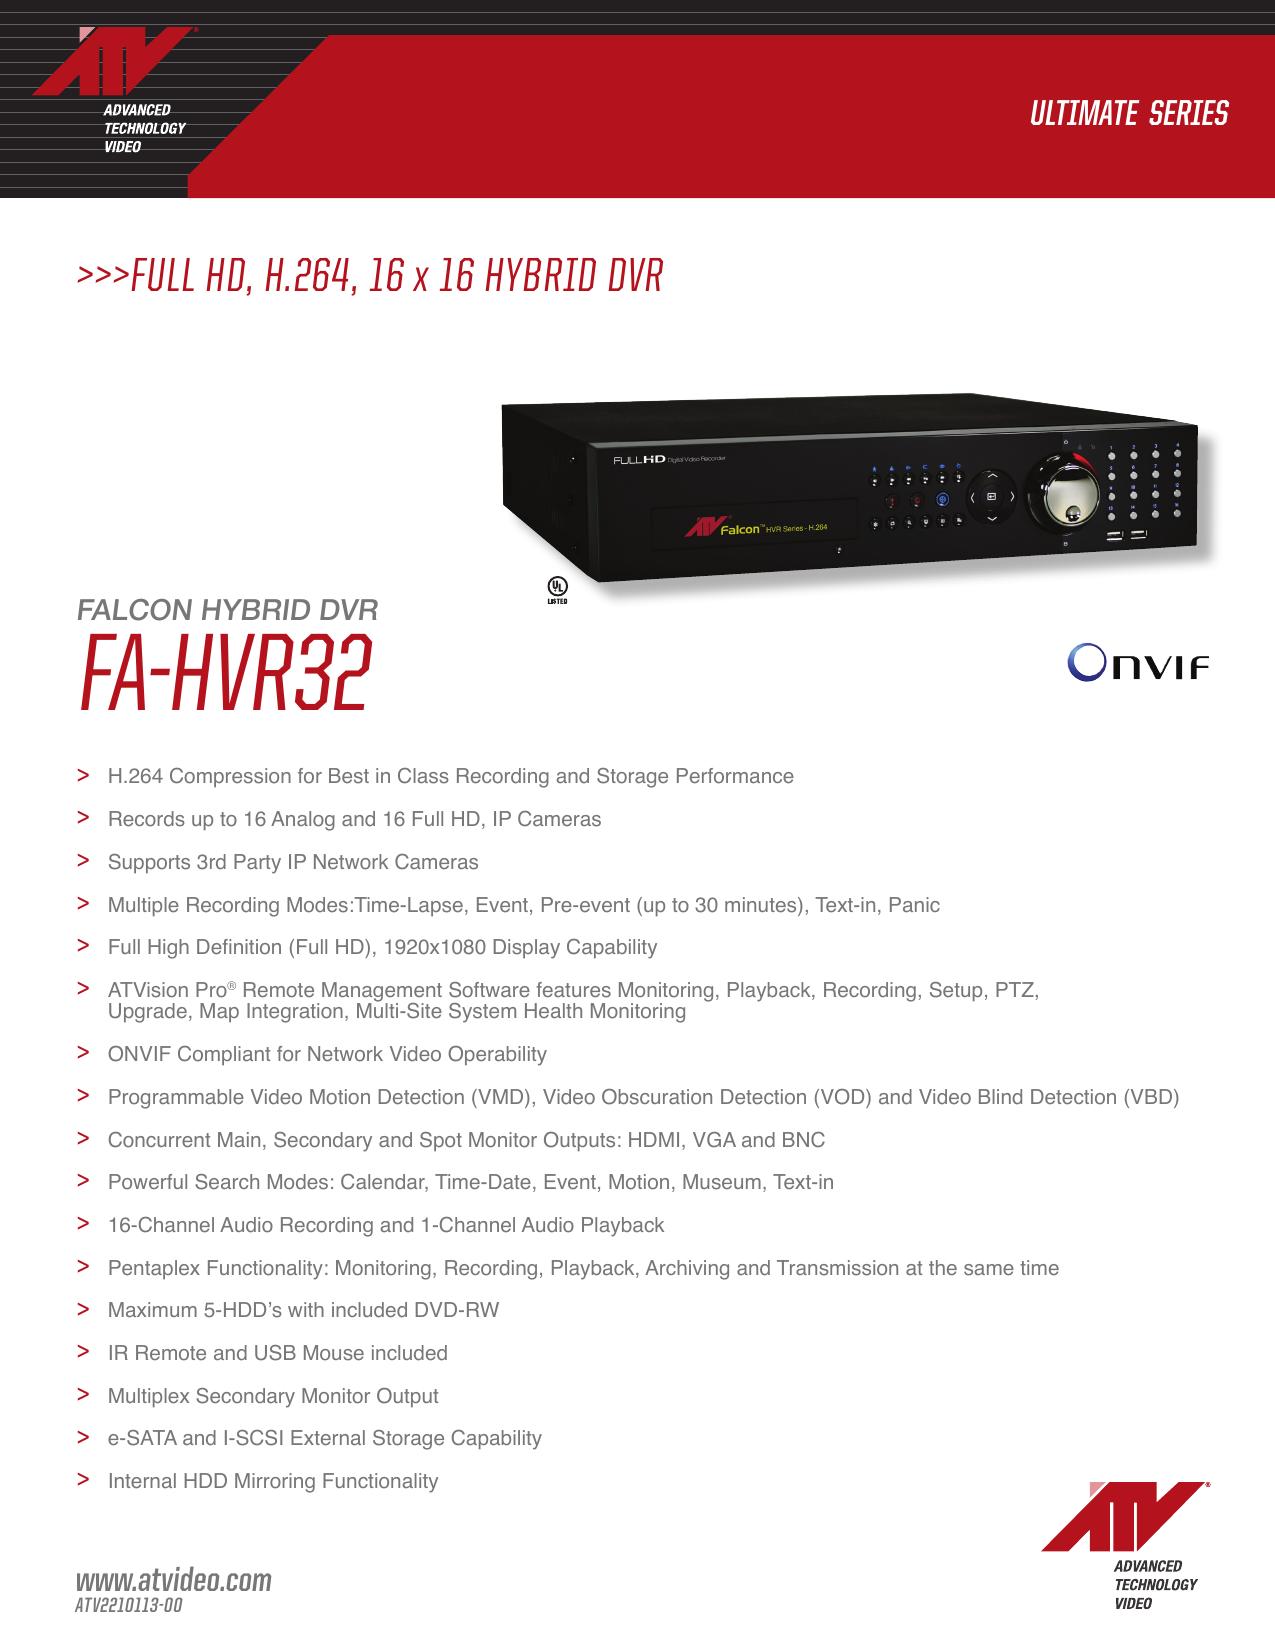 FA-HVr32 - Advanced Technology Video   manualzz com